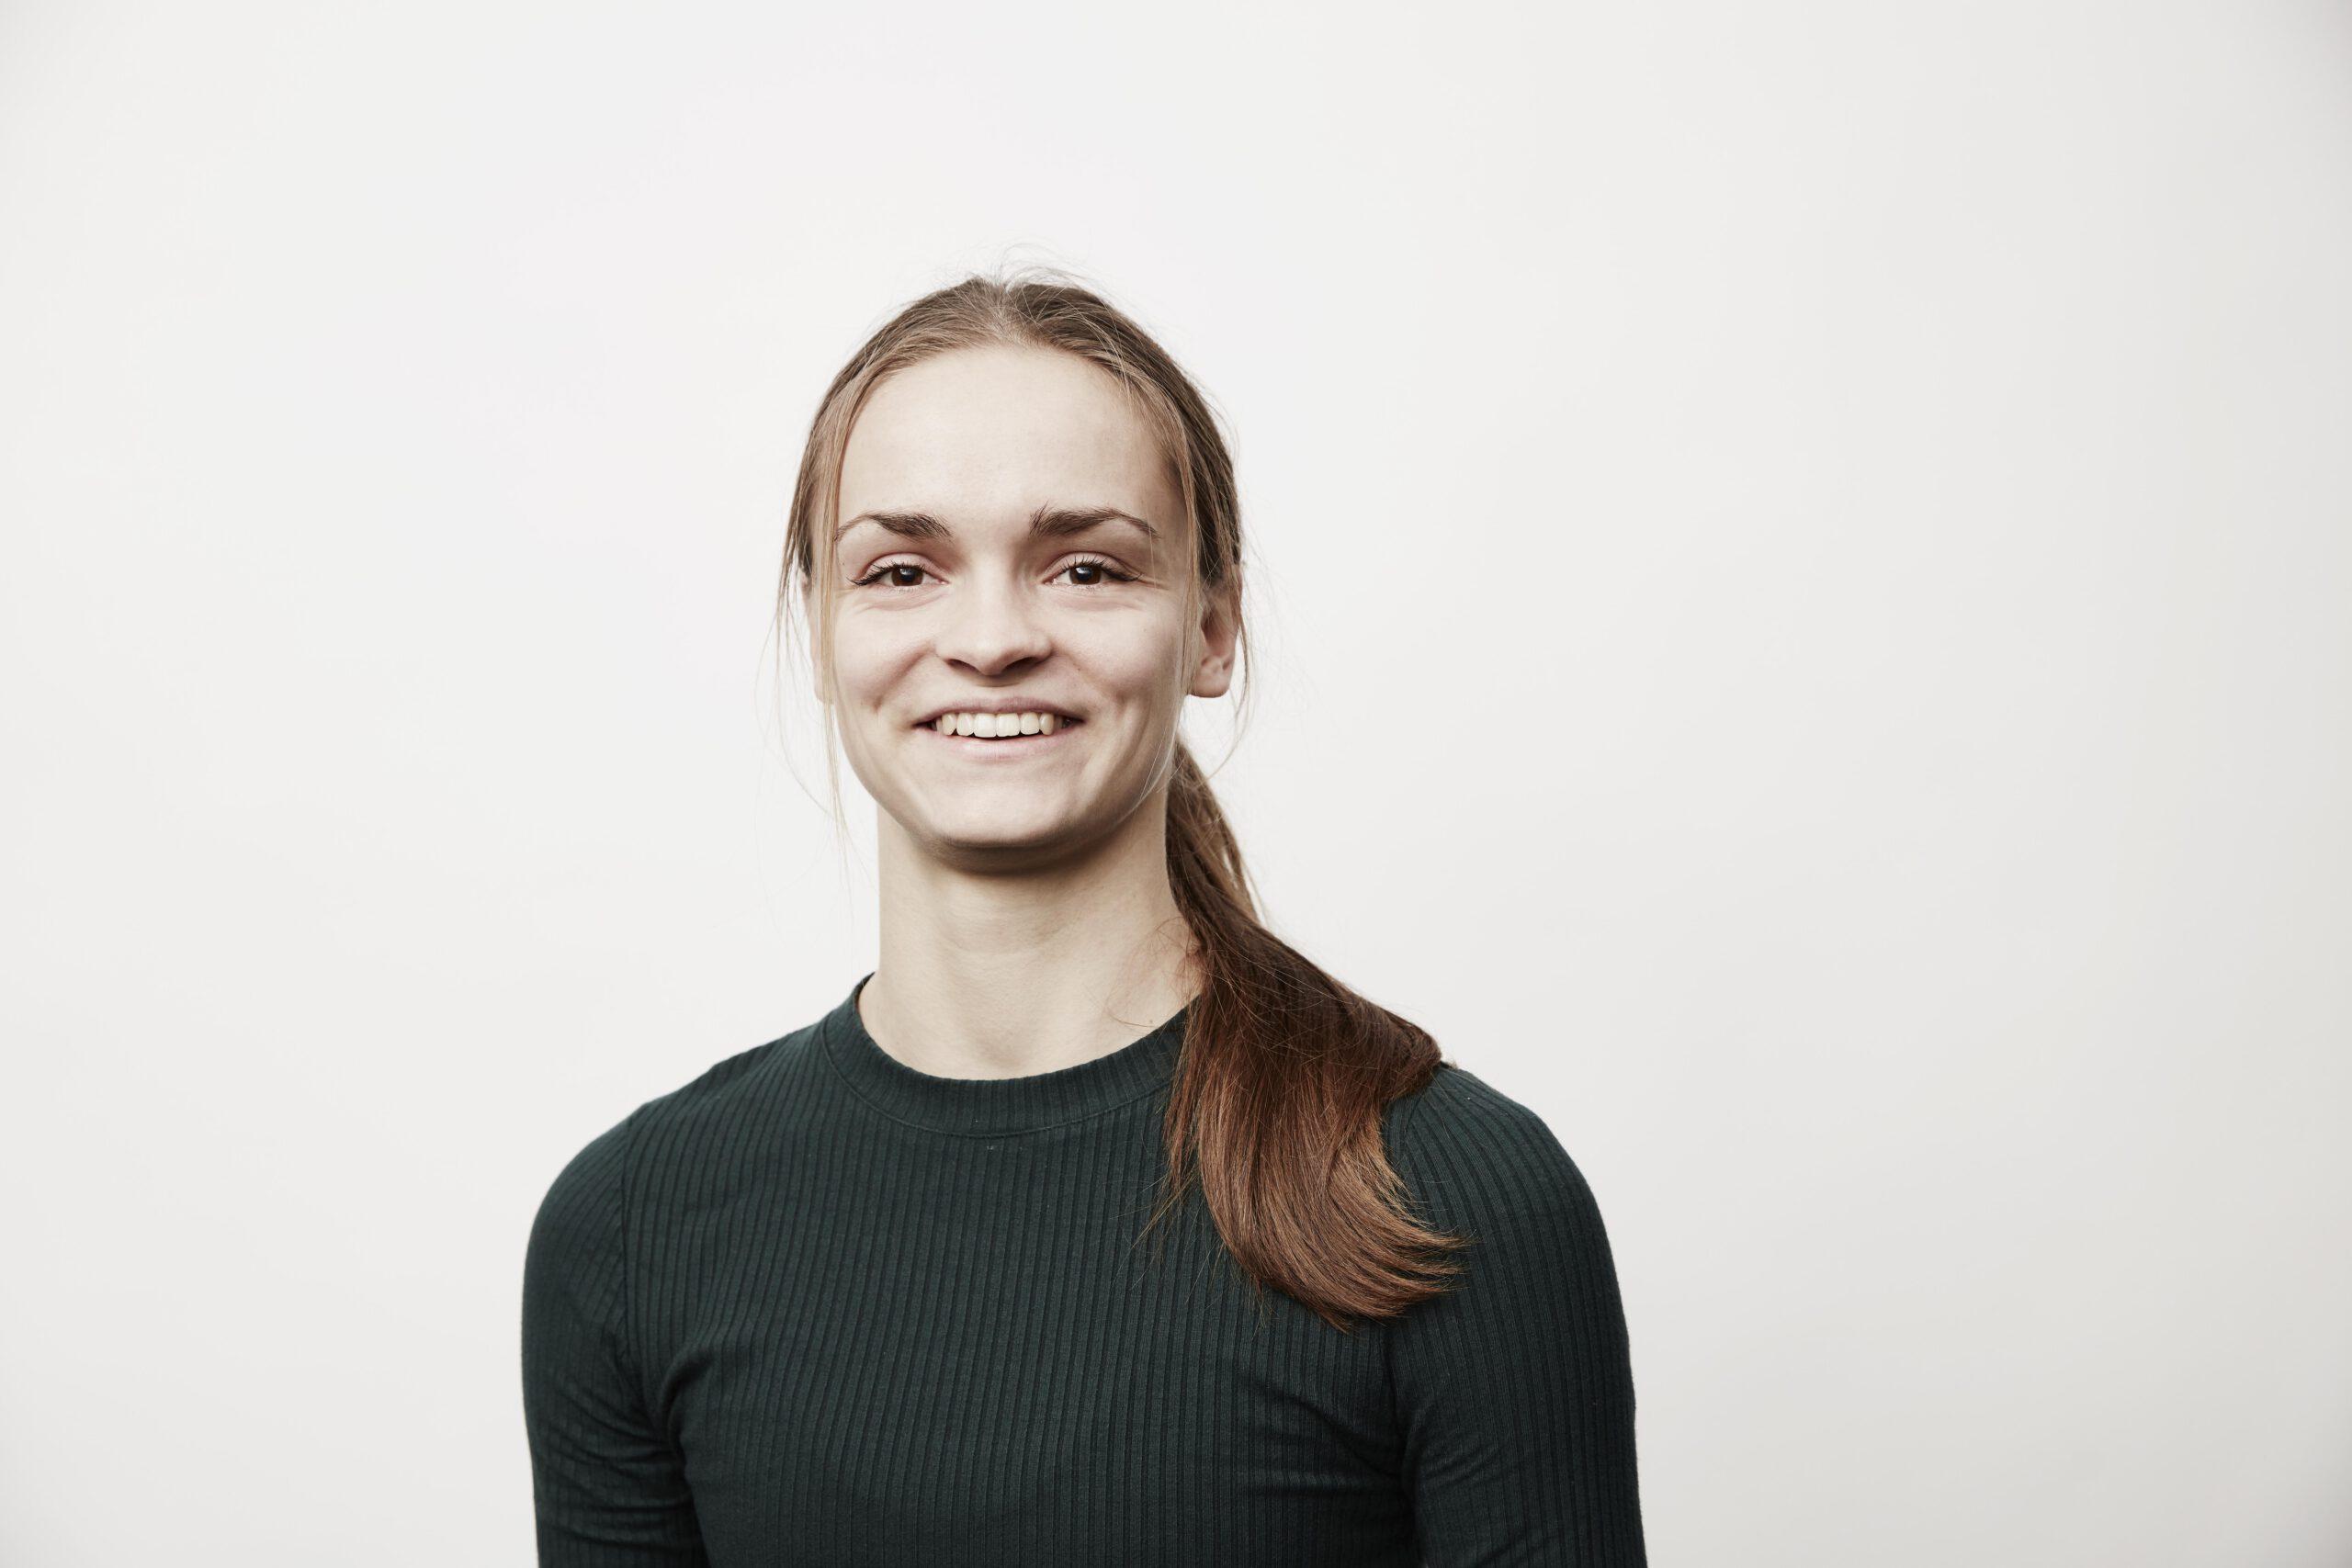 Anna Helmich